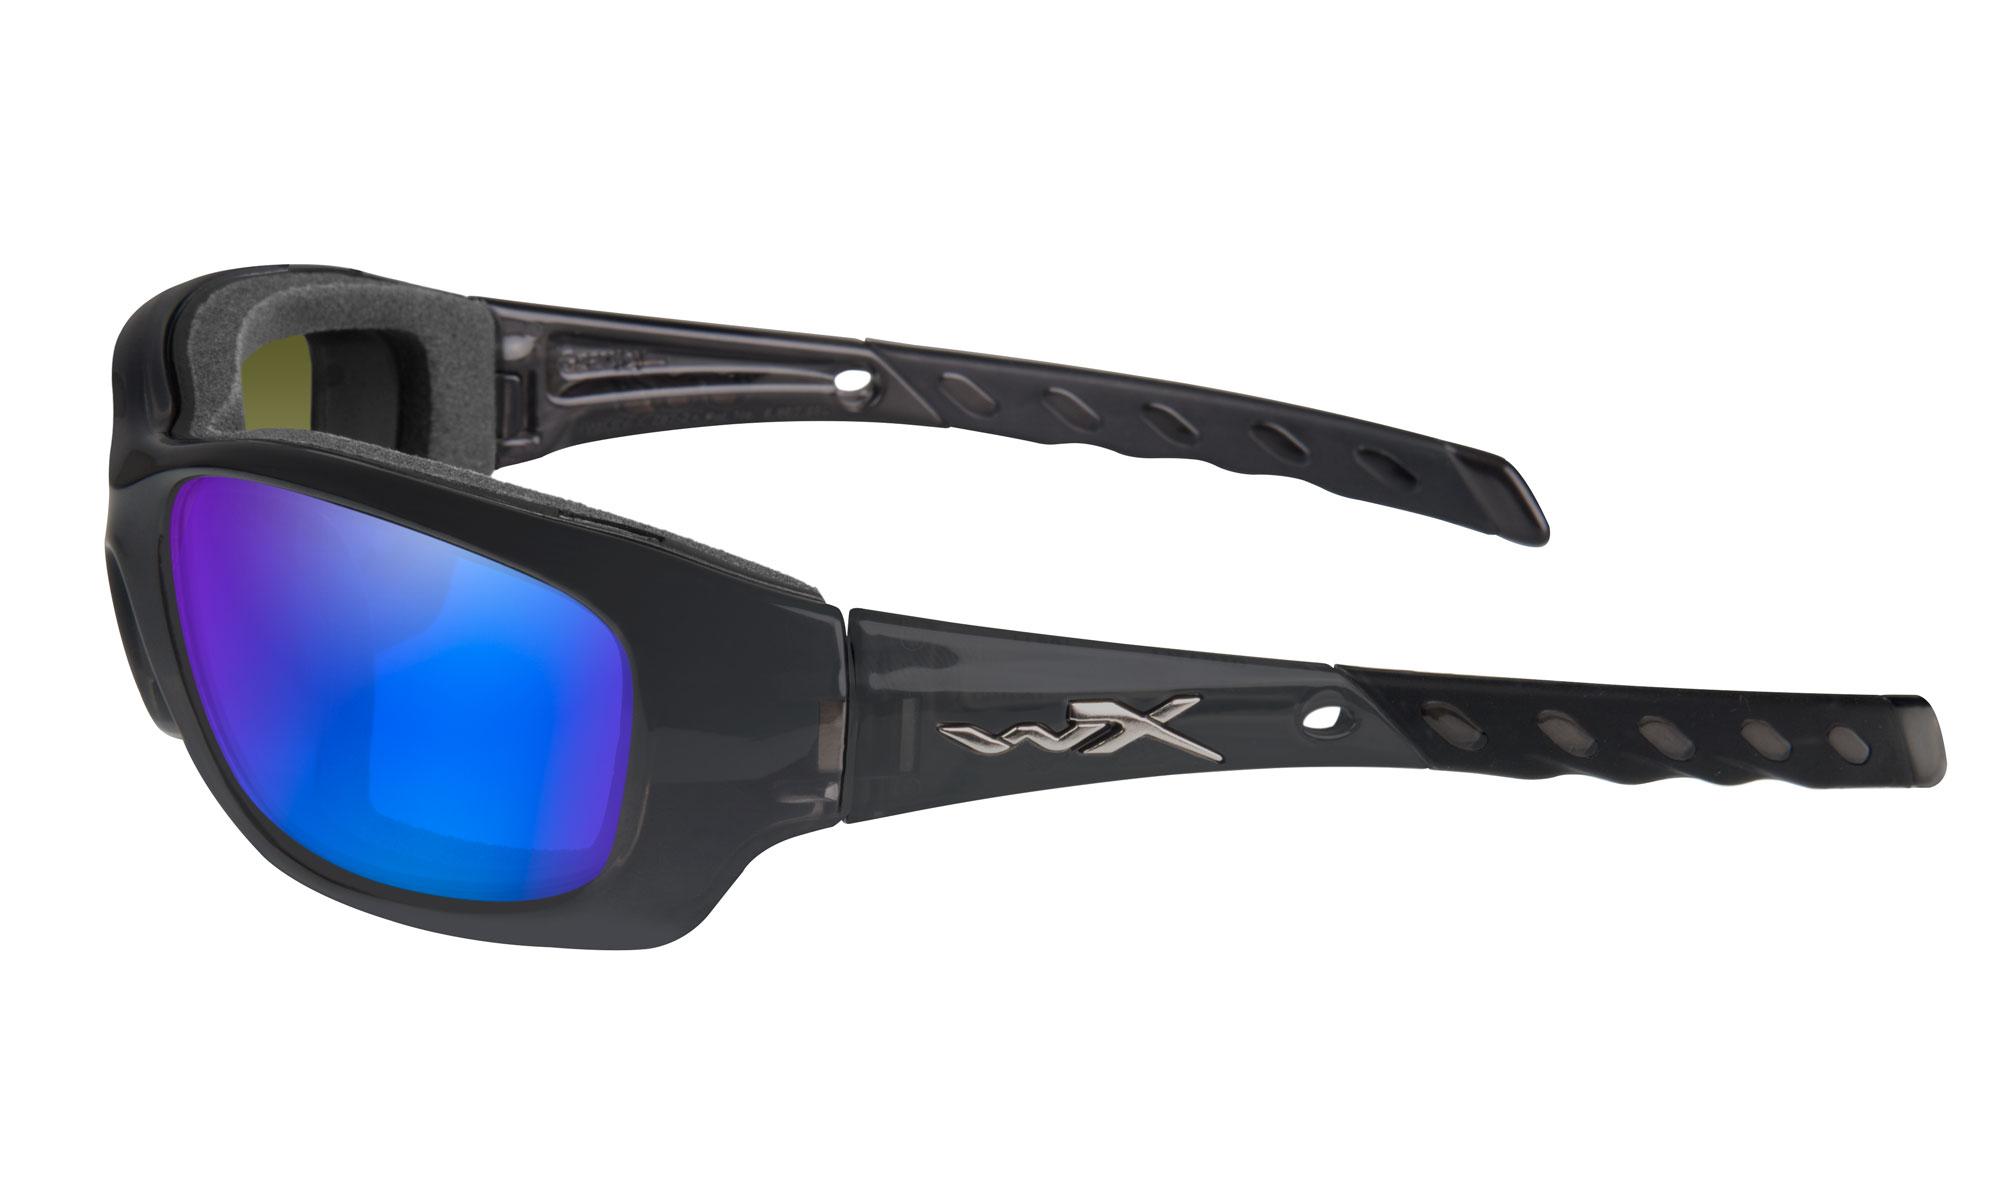 0d9f76ae37b Wiley X Gravity Sunglasses